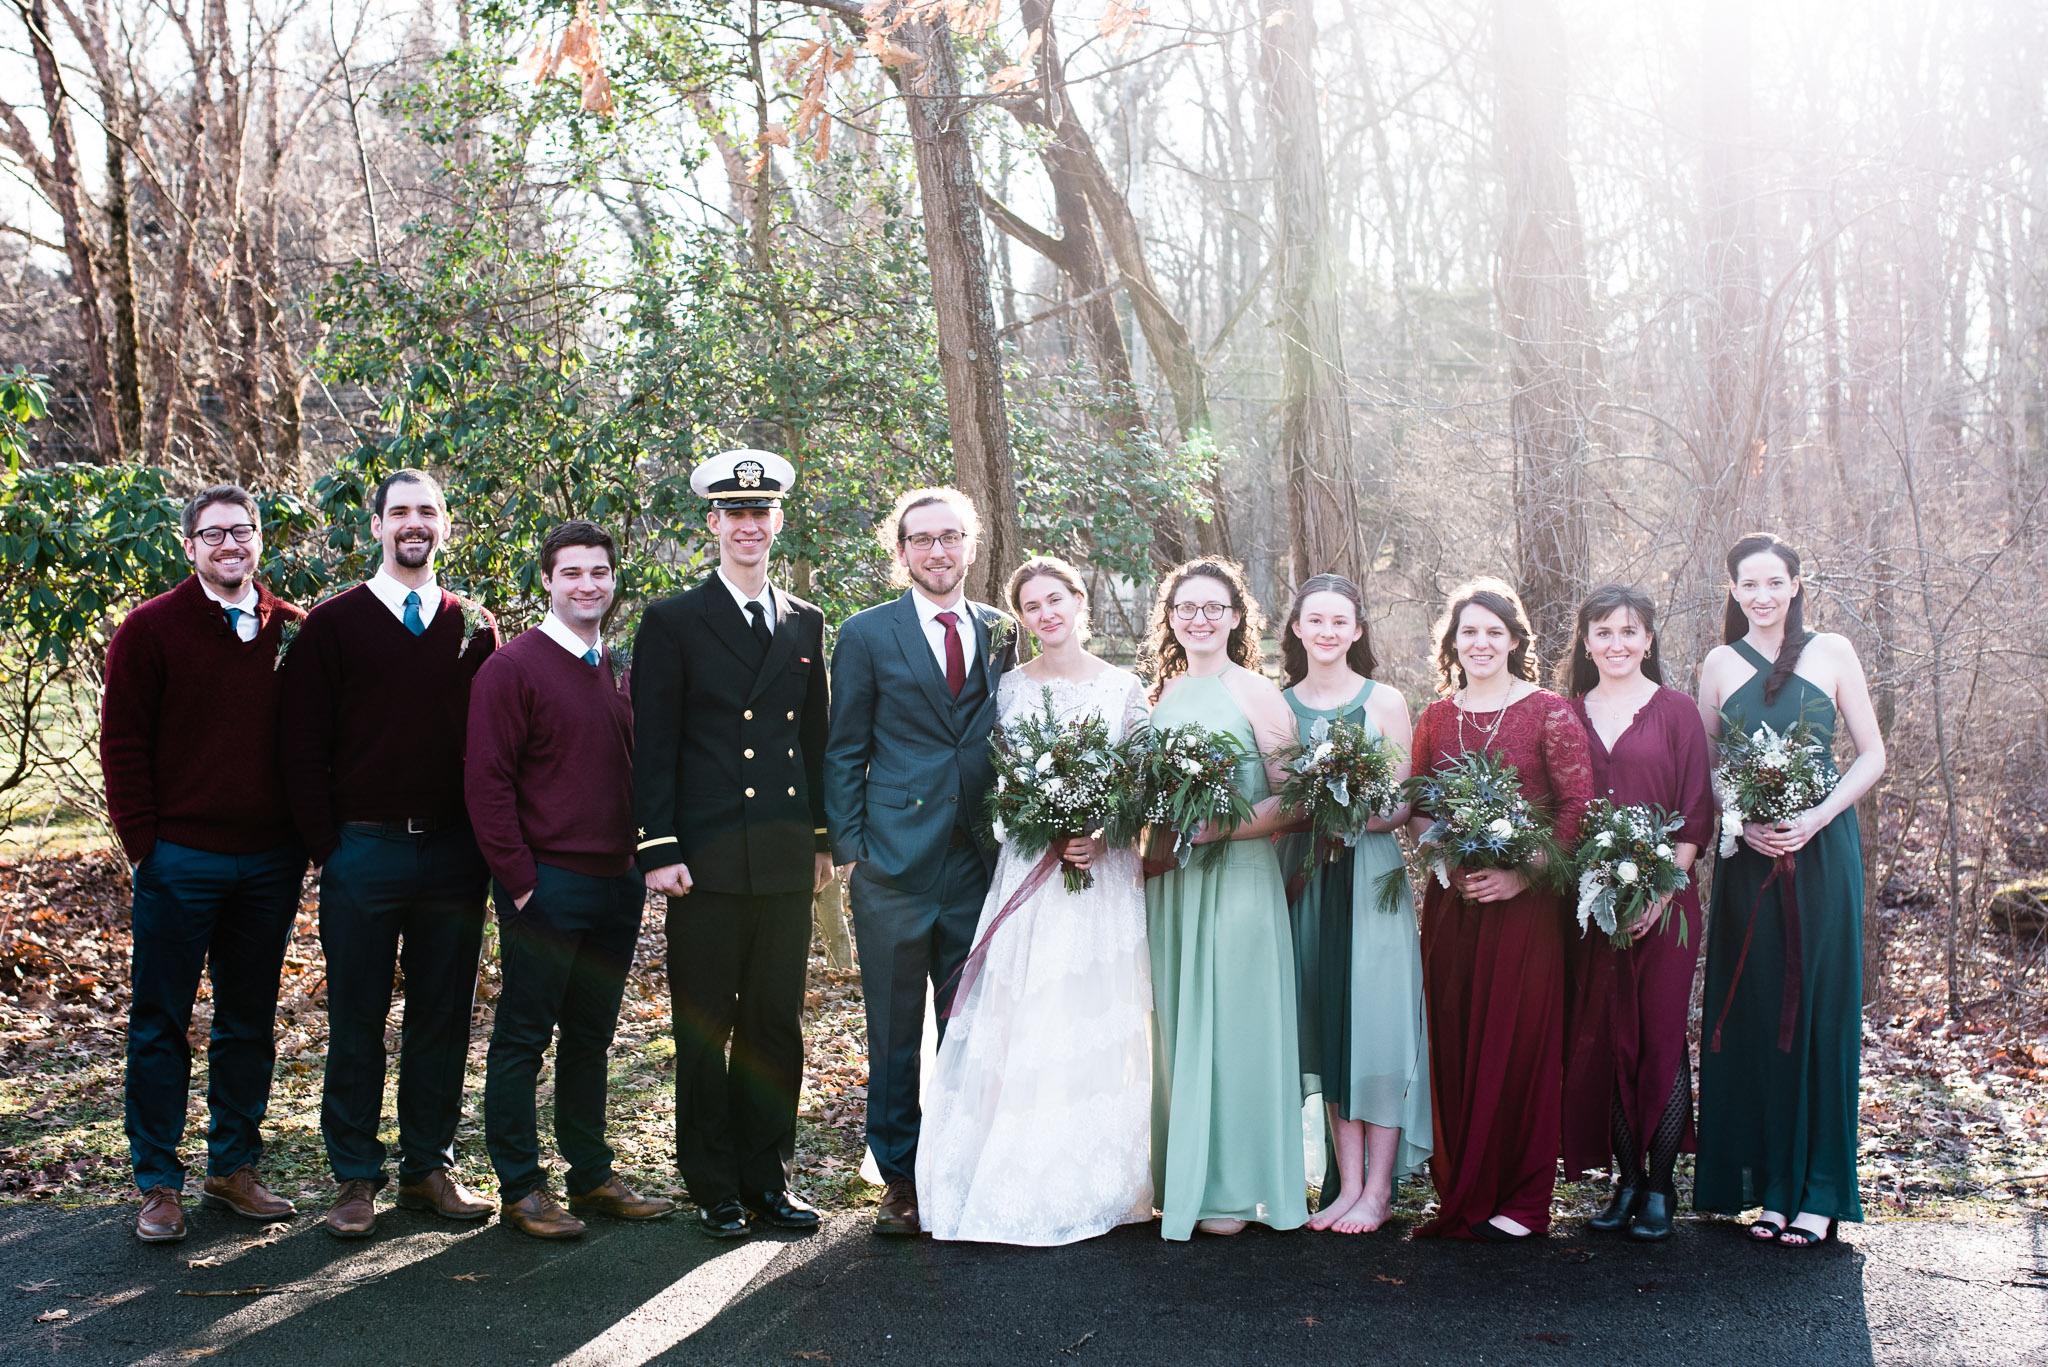 Ligonier Wedding Photographer, St Michaels Church, Ligonier PA -6623.jpg